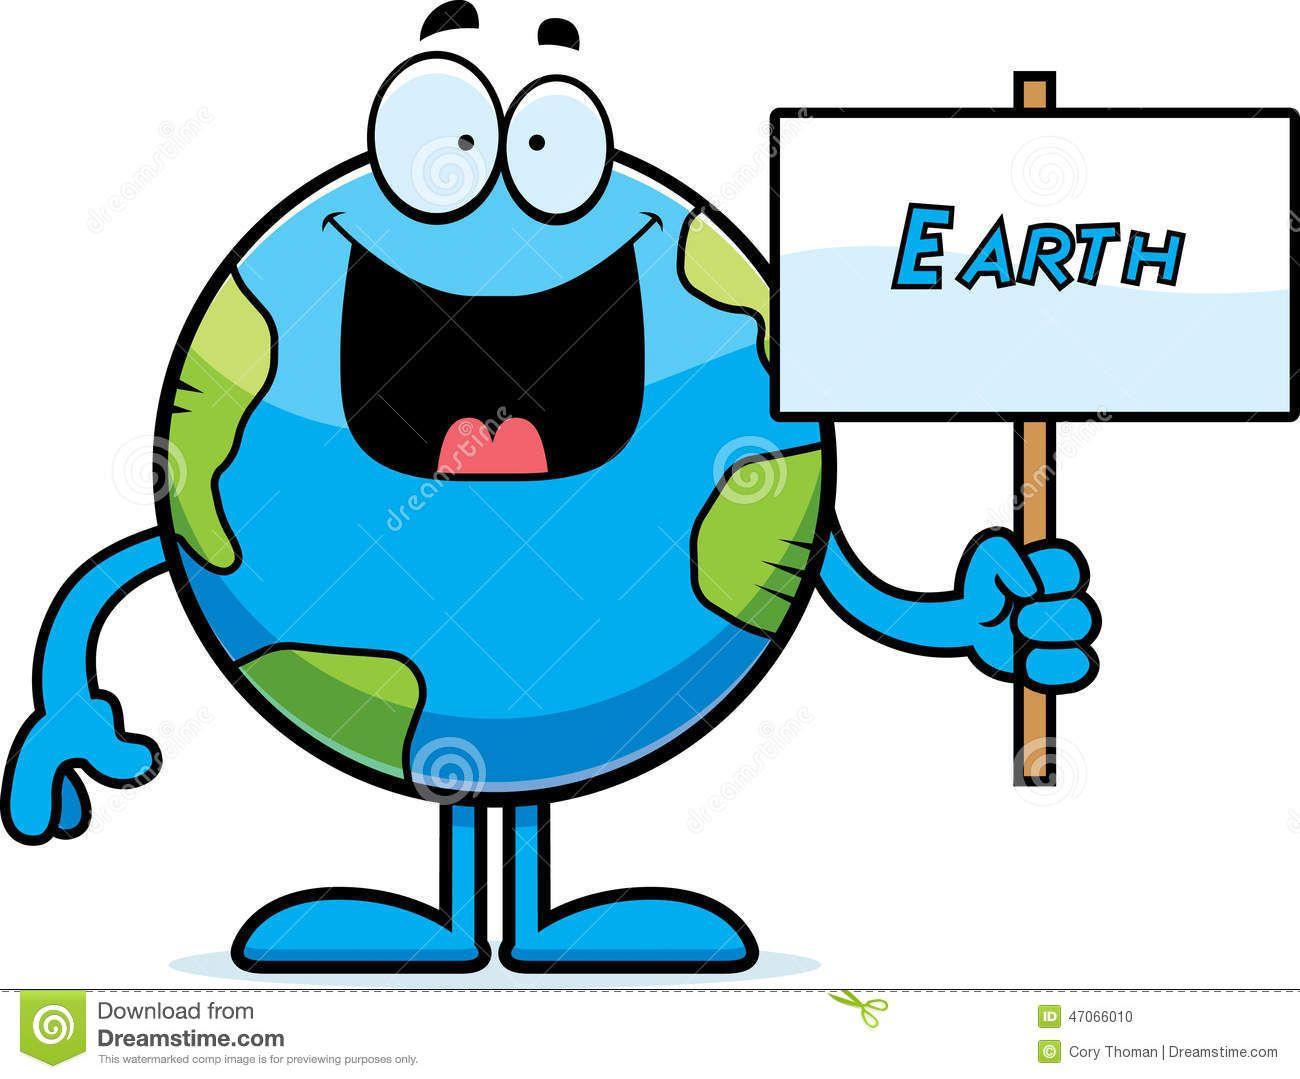 planeta terra animado - Pesquisa Google